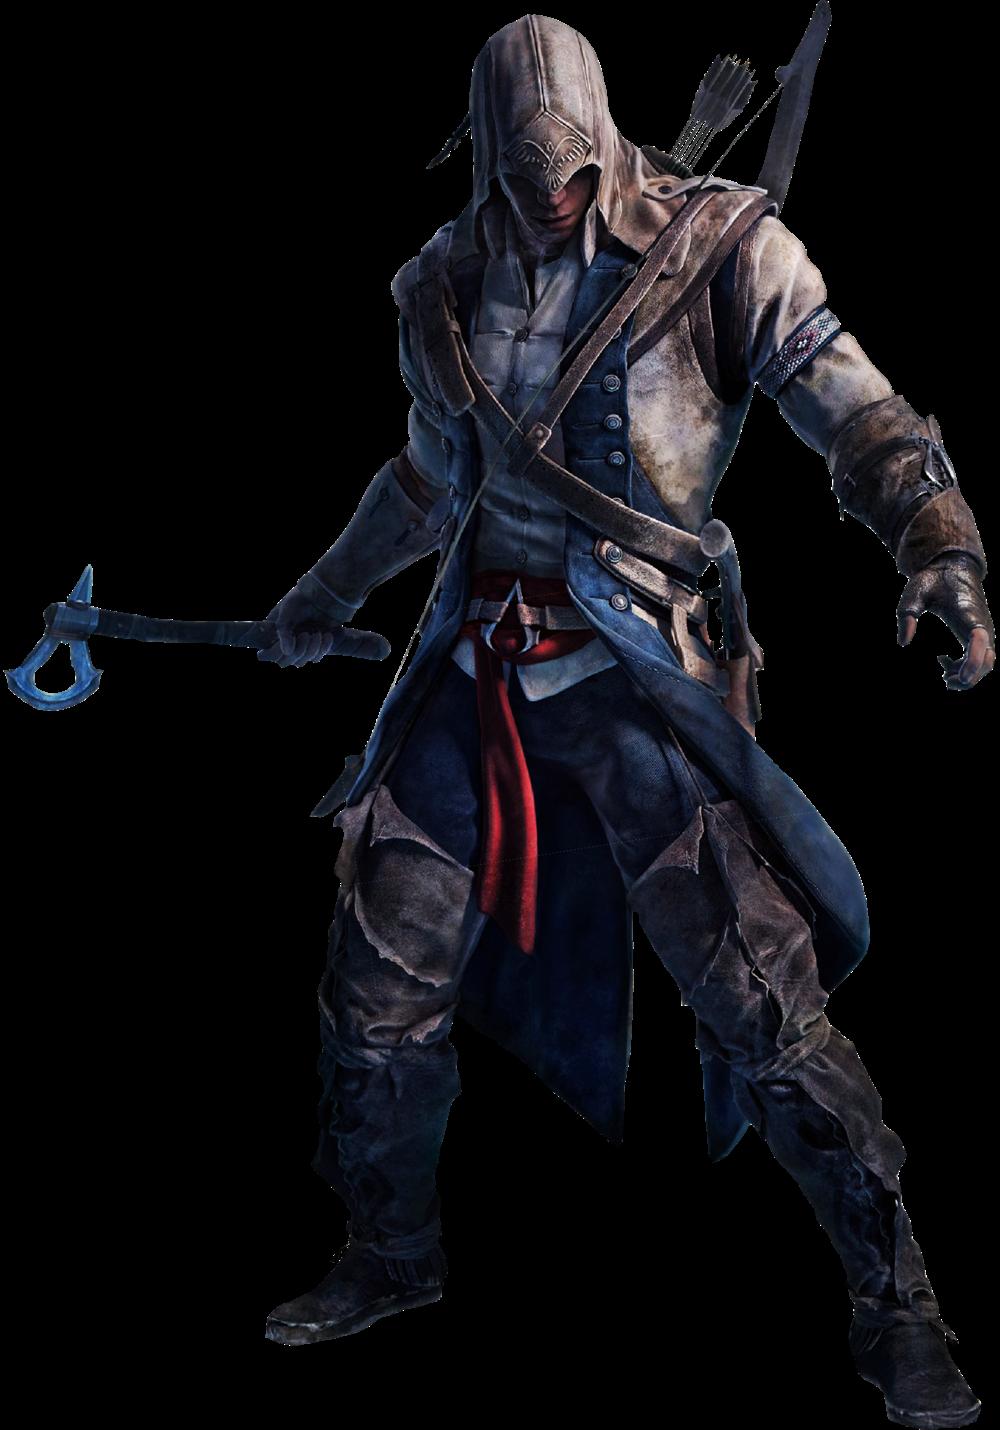 Connor Assassin S Creed Deadliest Fiction Wiki Fandom